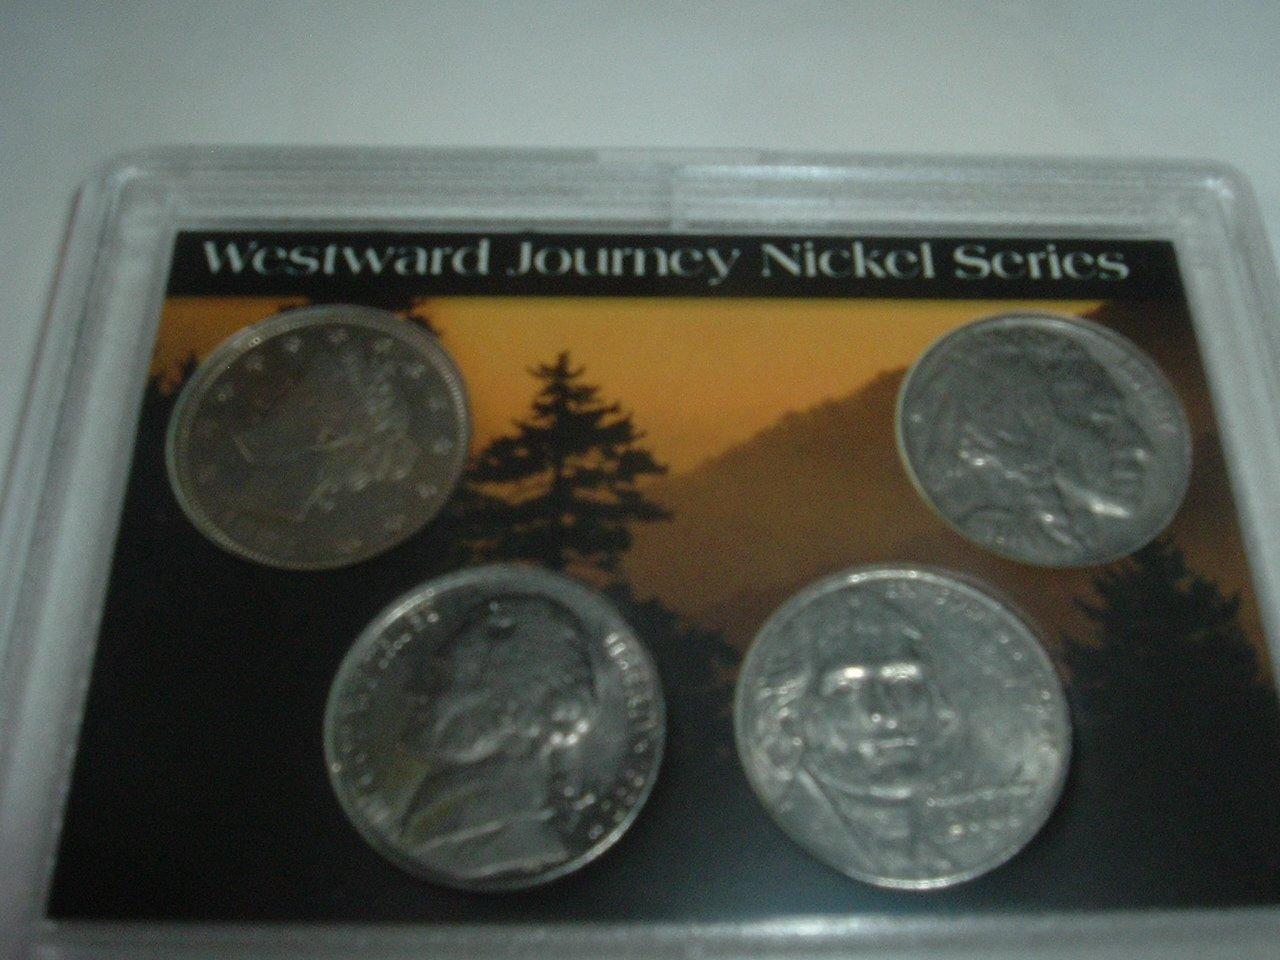 Two Centuries of Nickels